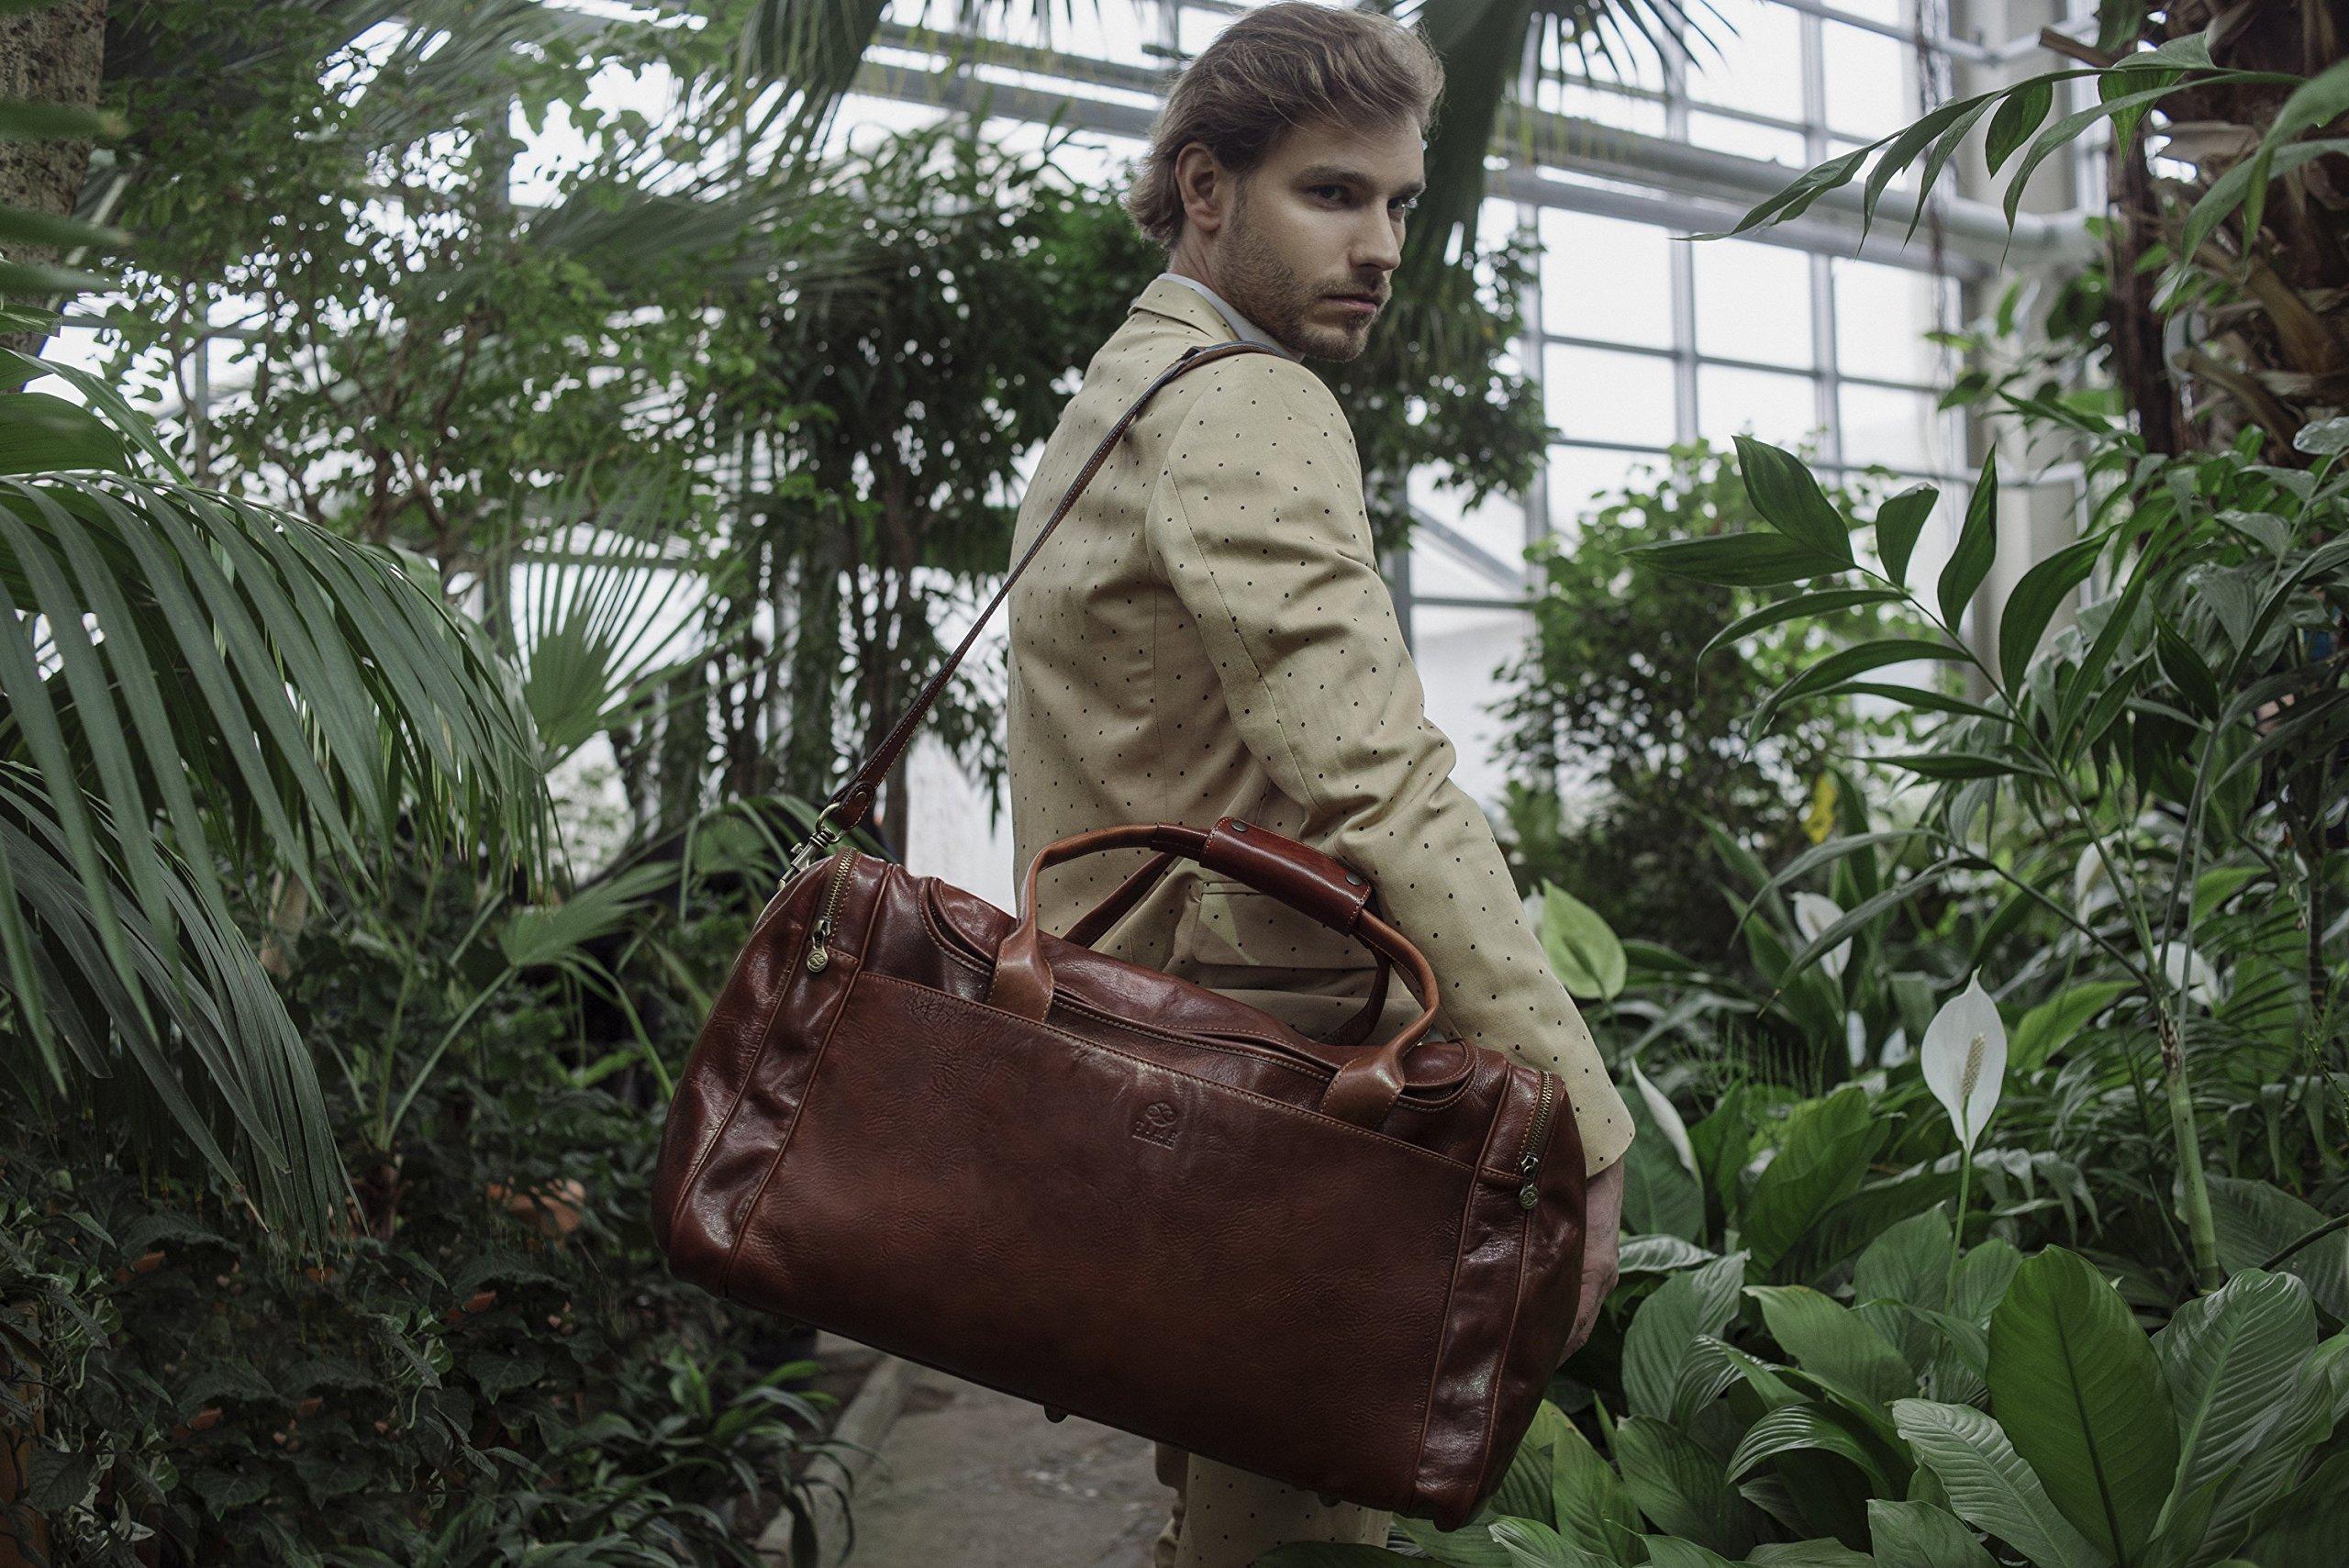 Leather Duffel Bag, Weekend Bag, Gym, Large Travel Bag, Cognac, Brown - Time Resistance by Time Resistance (Image #7)